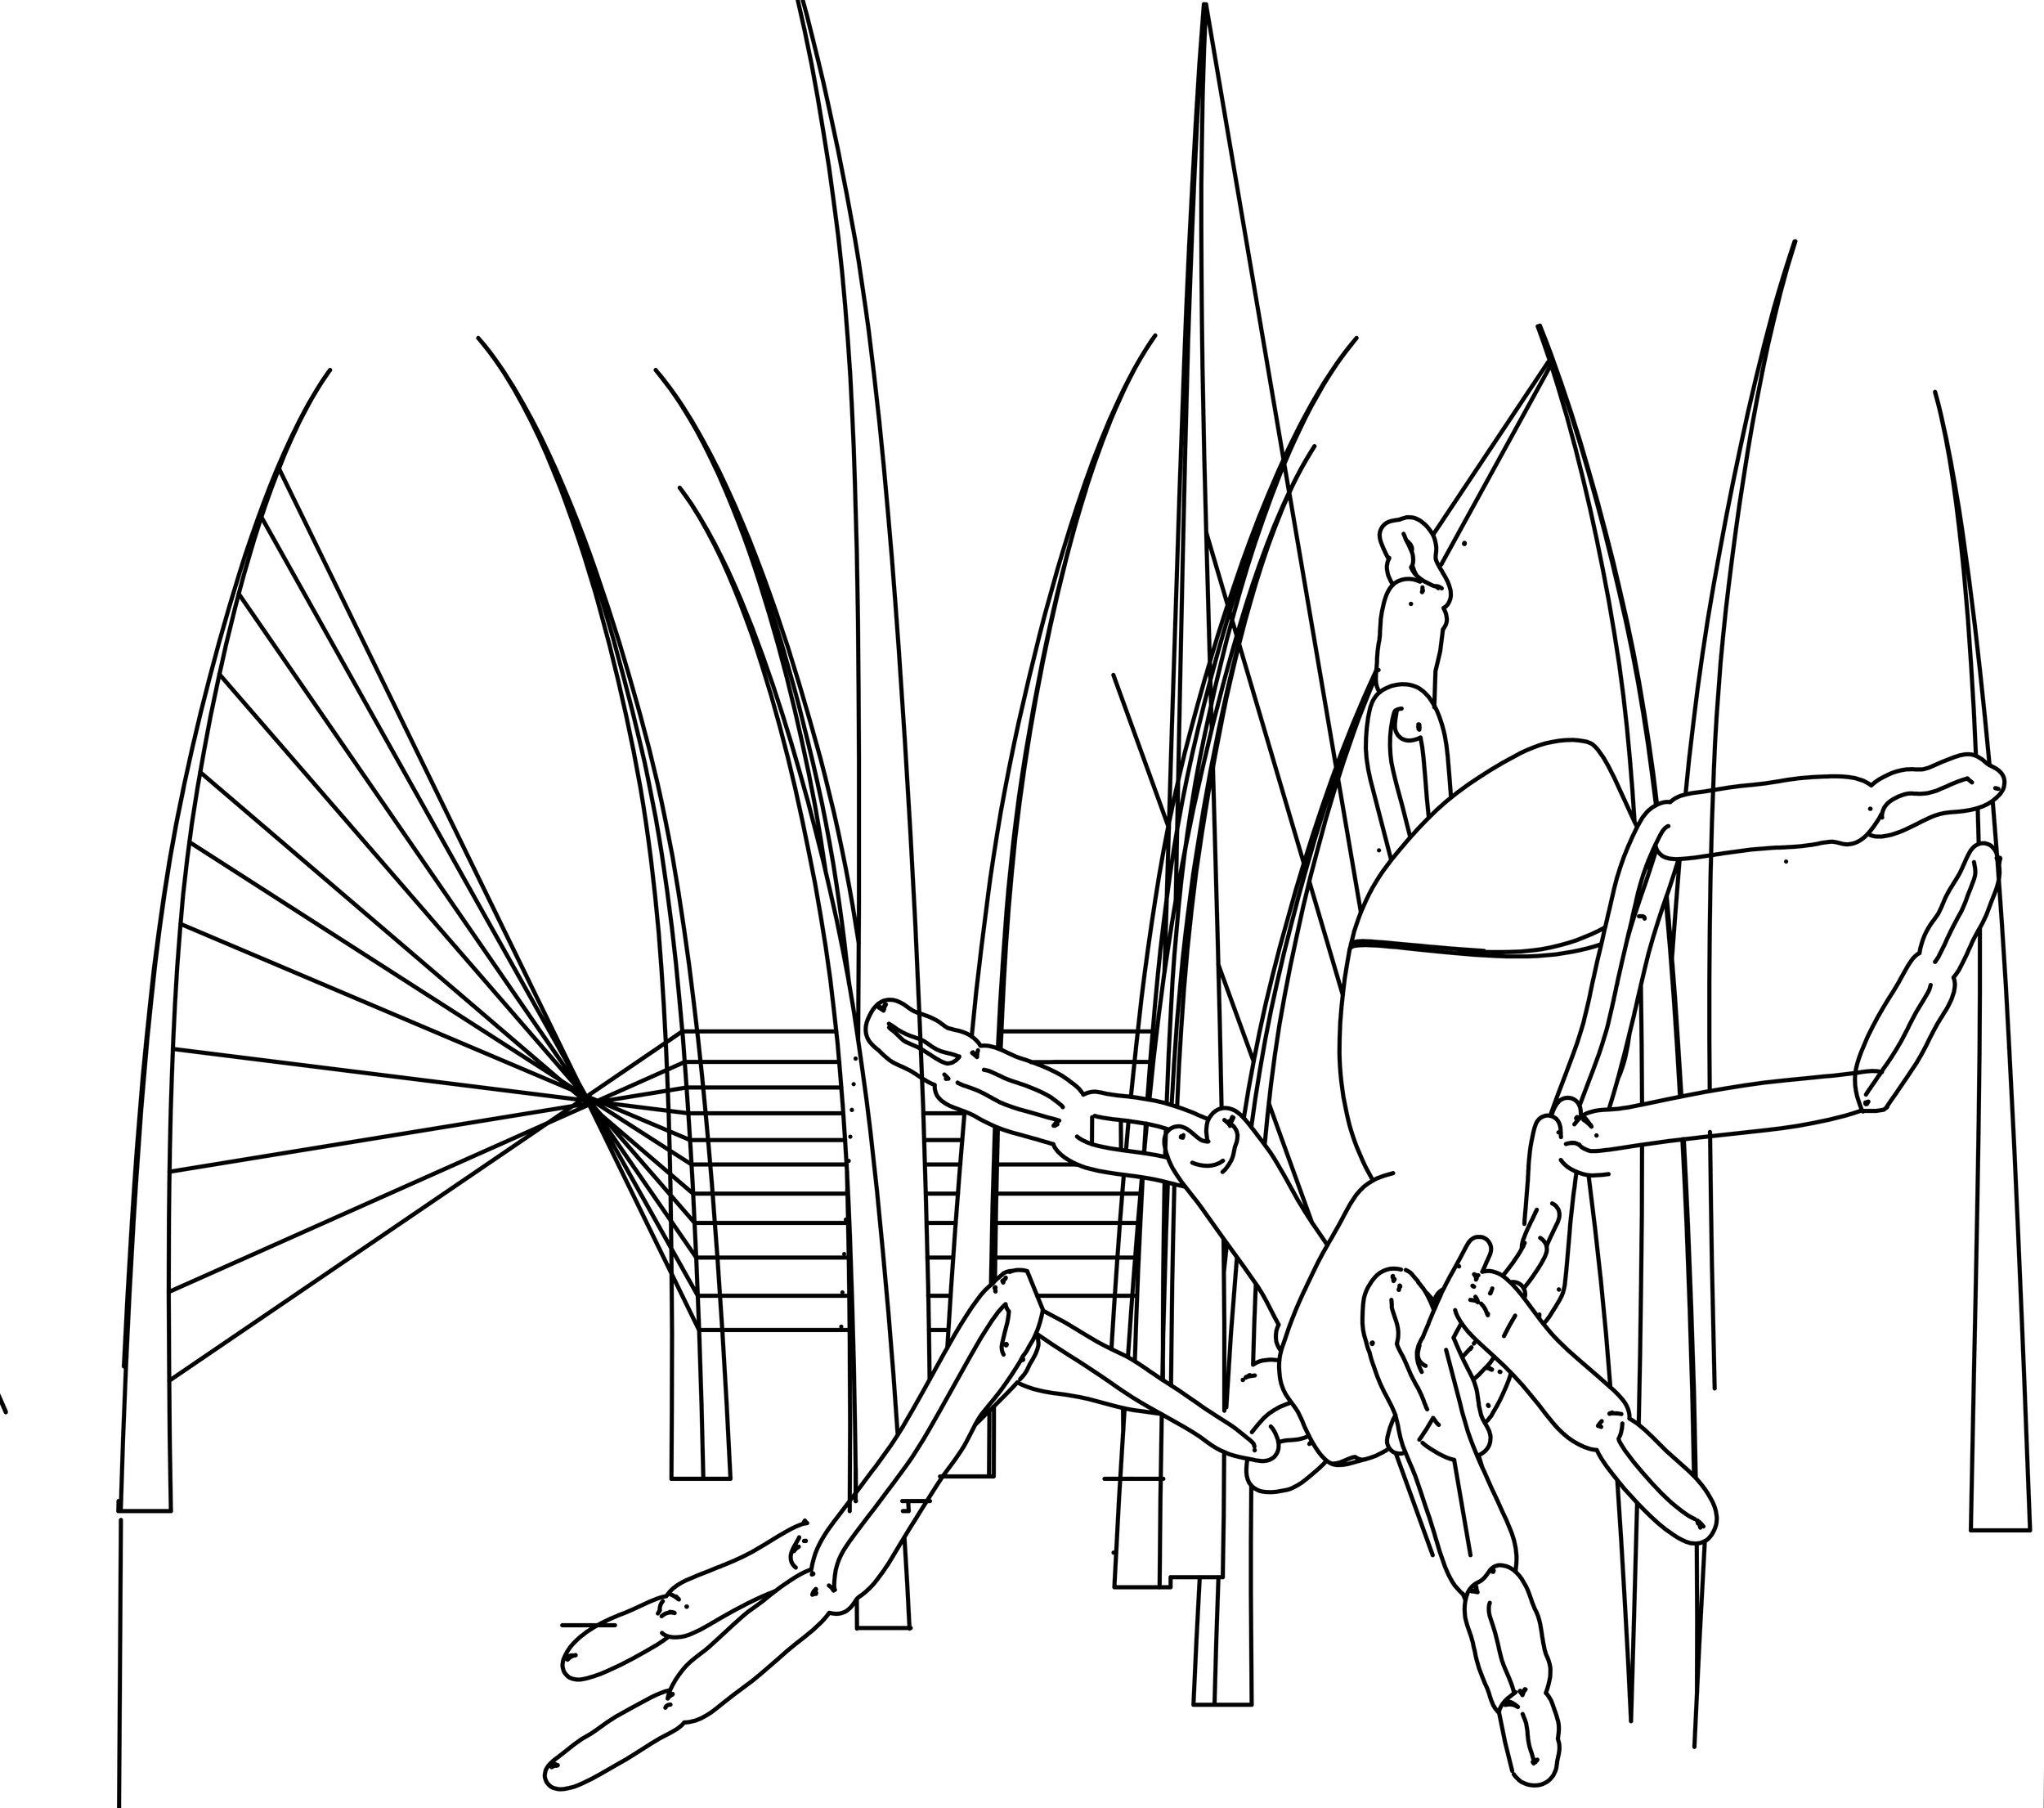 Waterloo interim landscaping plan-Fen raft spider 230419.jpg